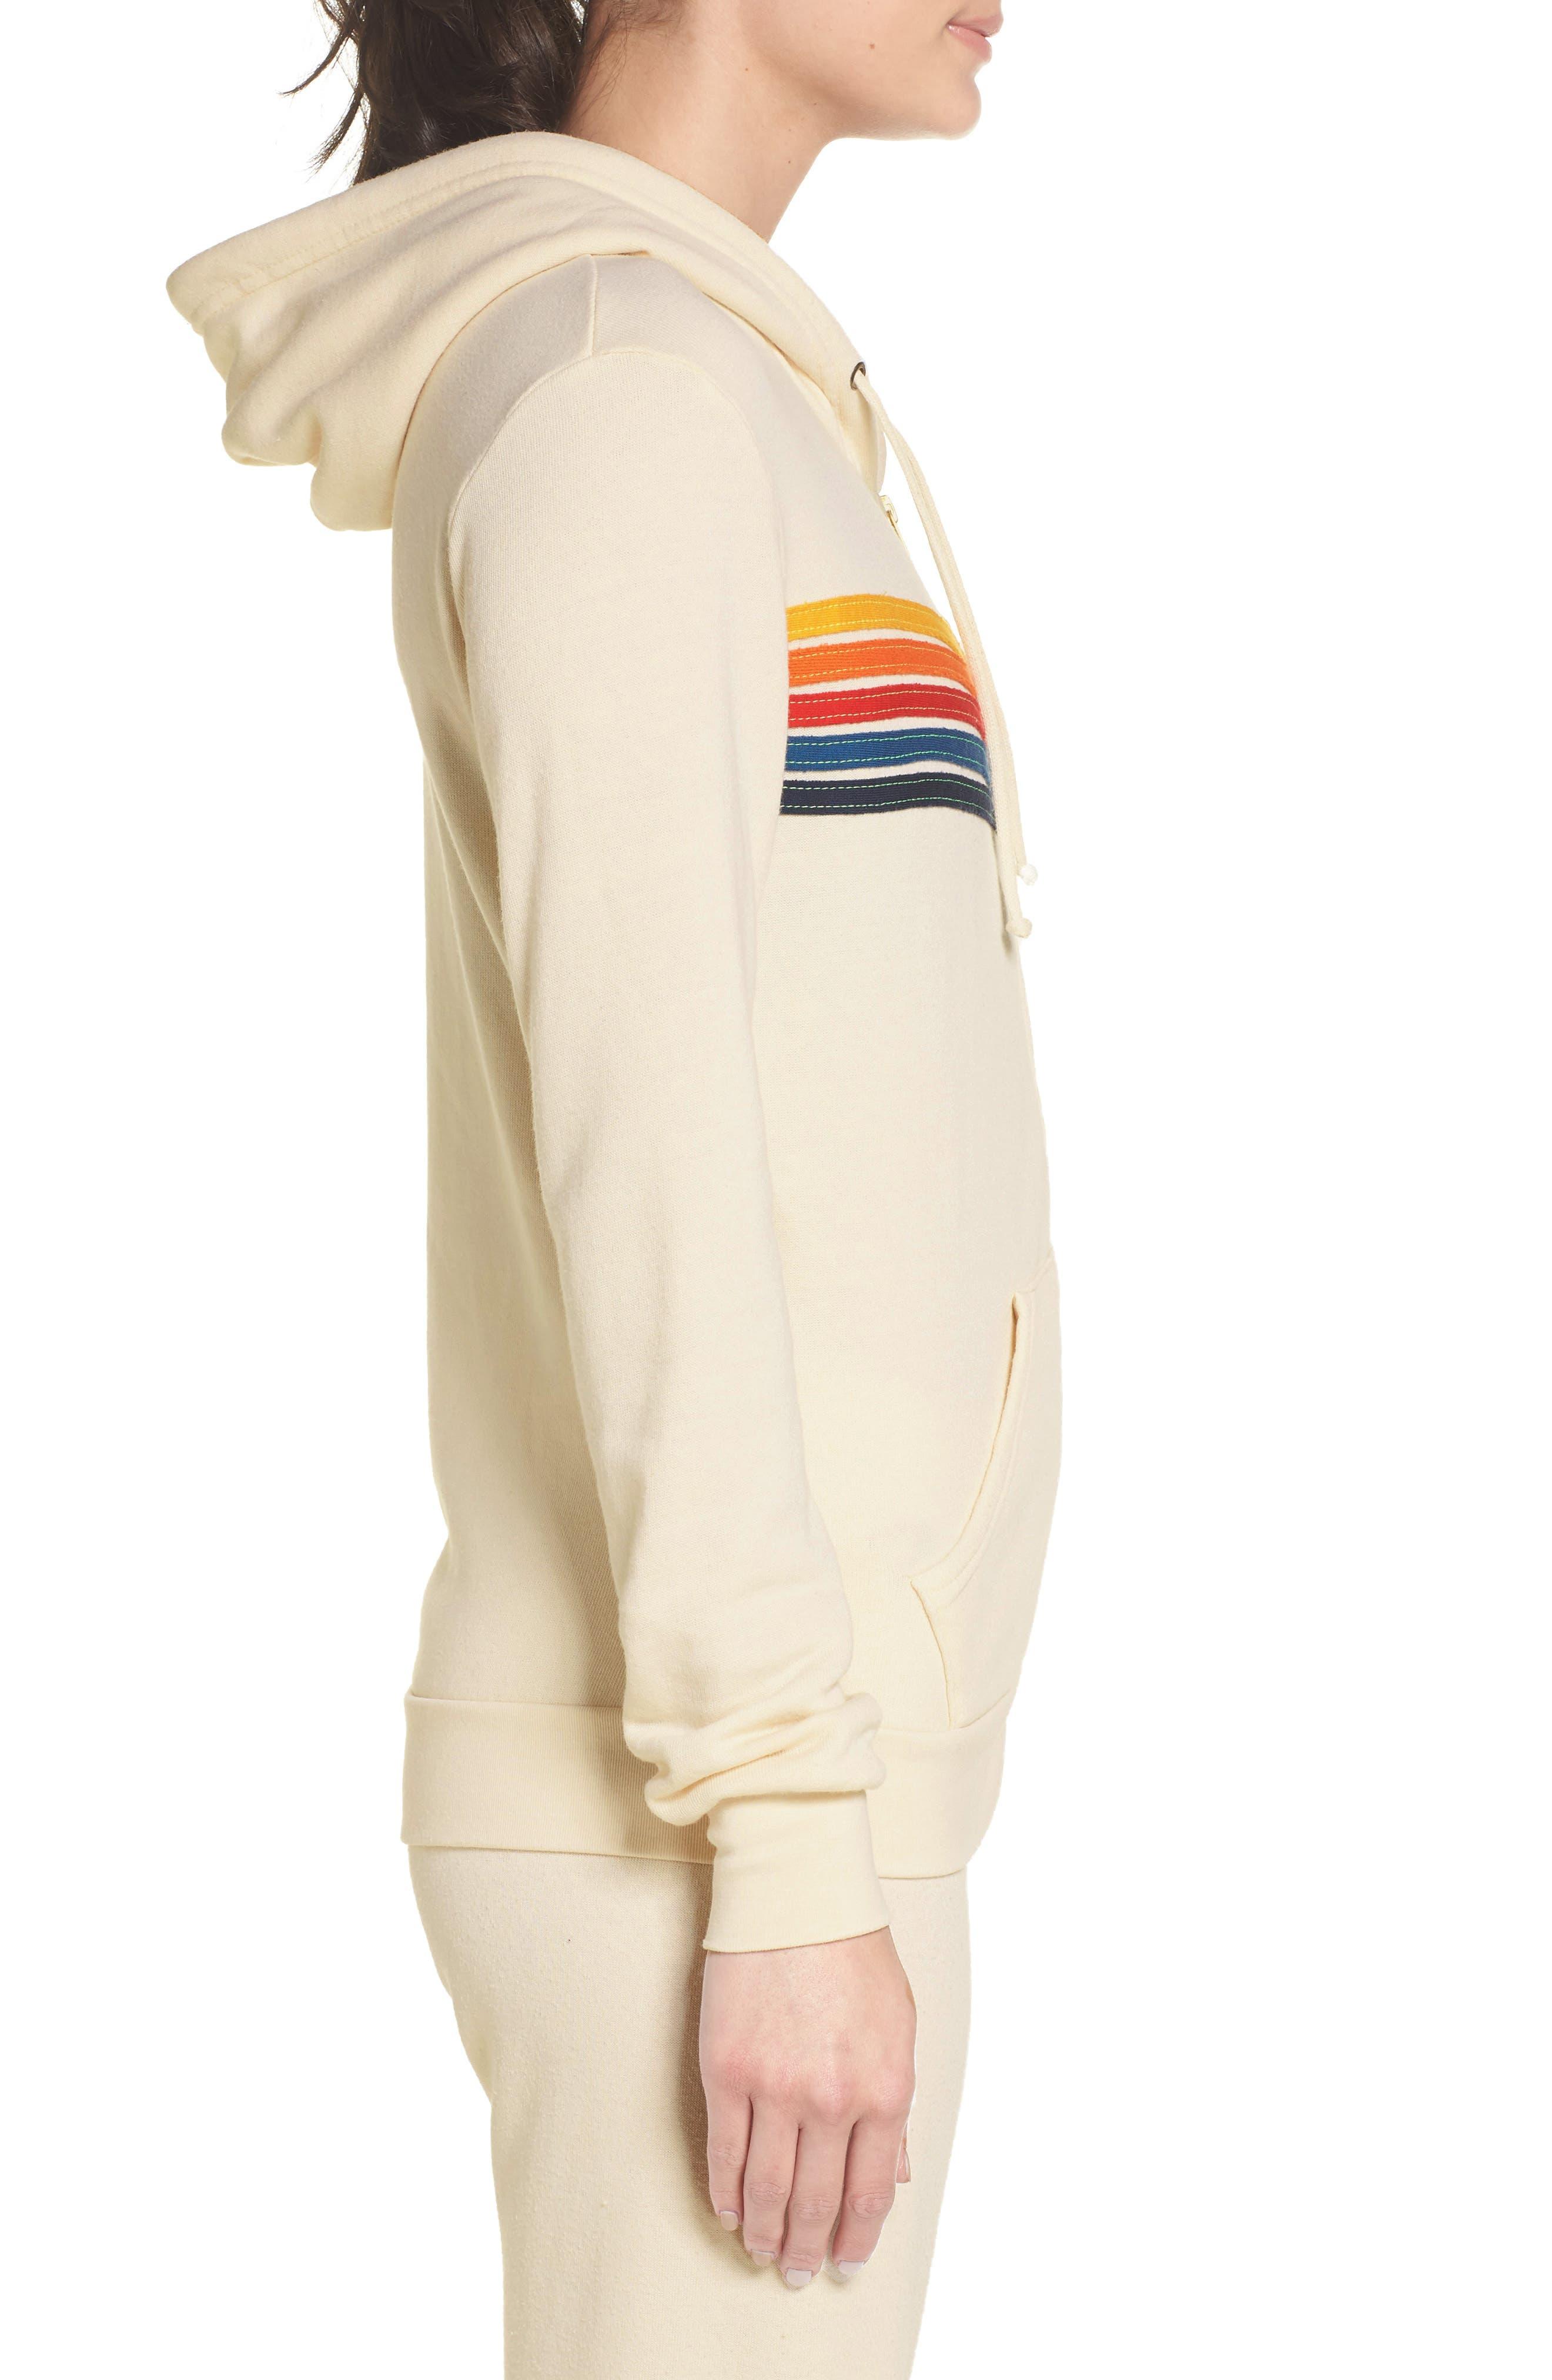 AVIATOR NATION,                             5-Stripe Zip Hoodie,                             Alternate thumbnail 3, color,                             VINTAGE WHITE